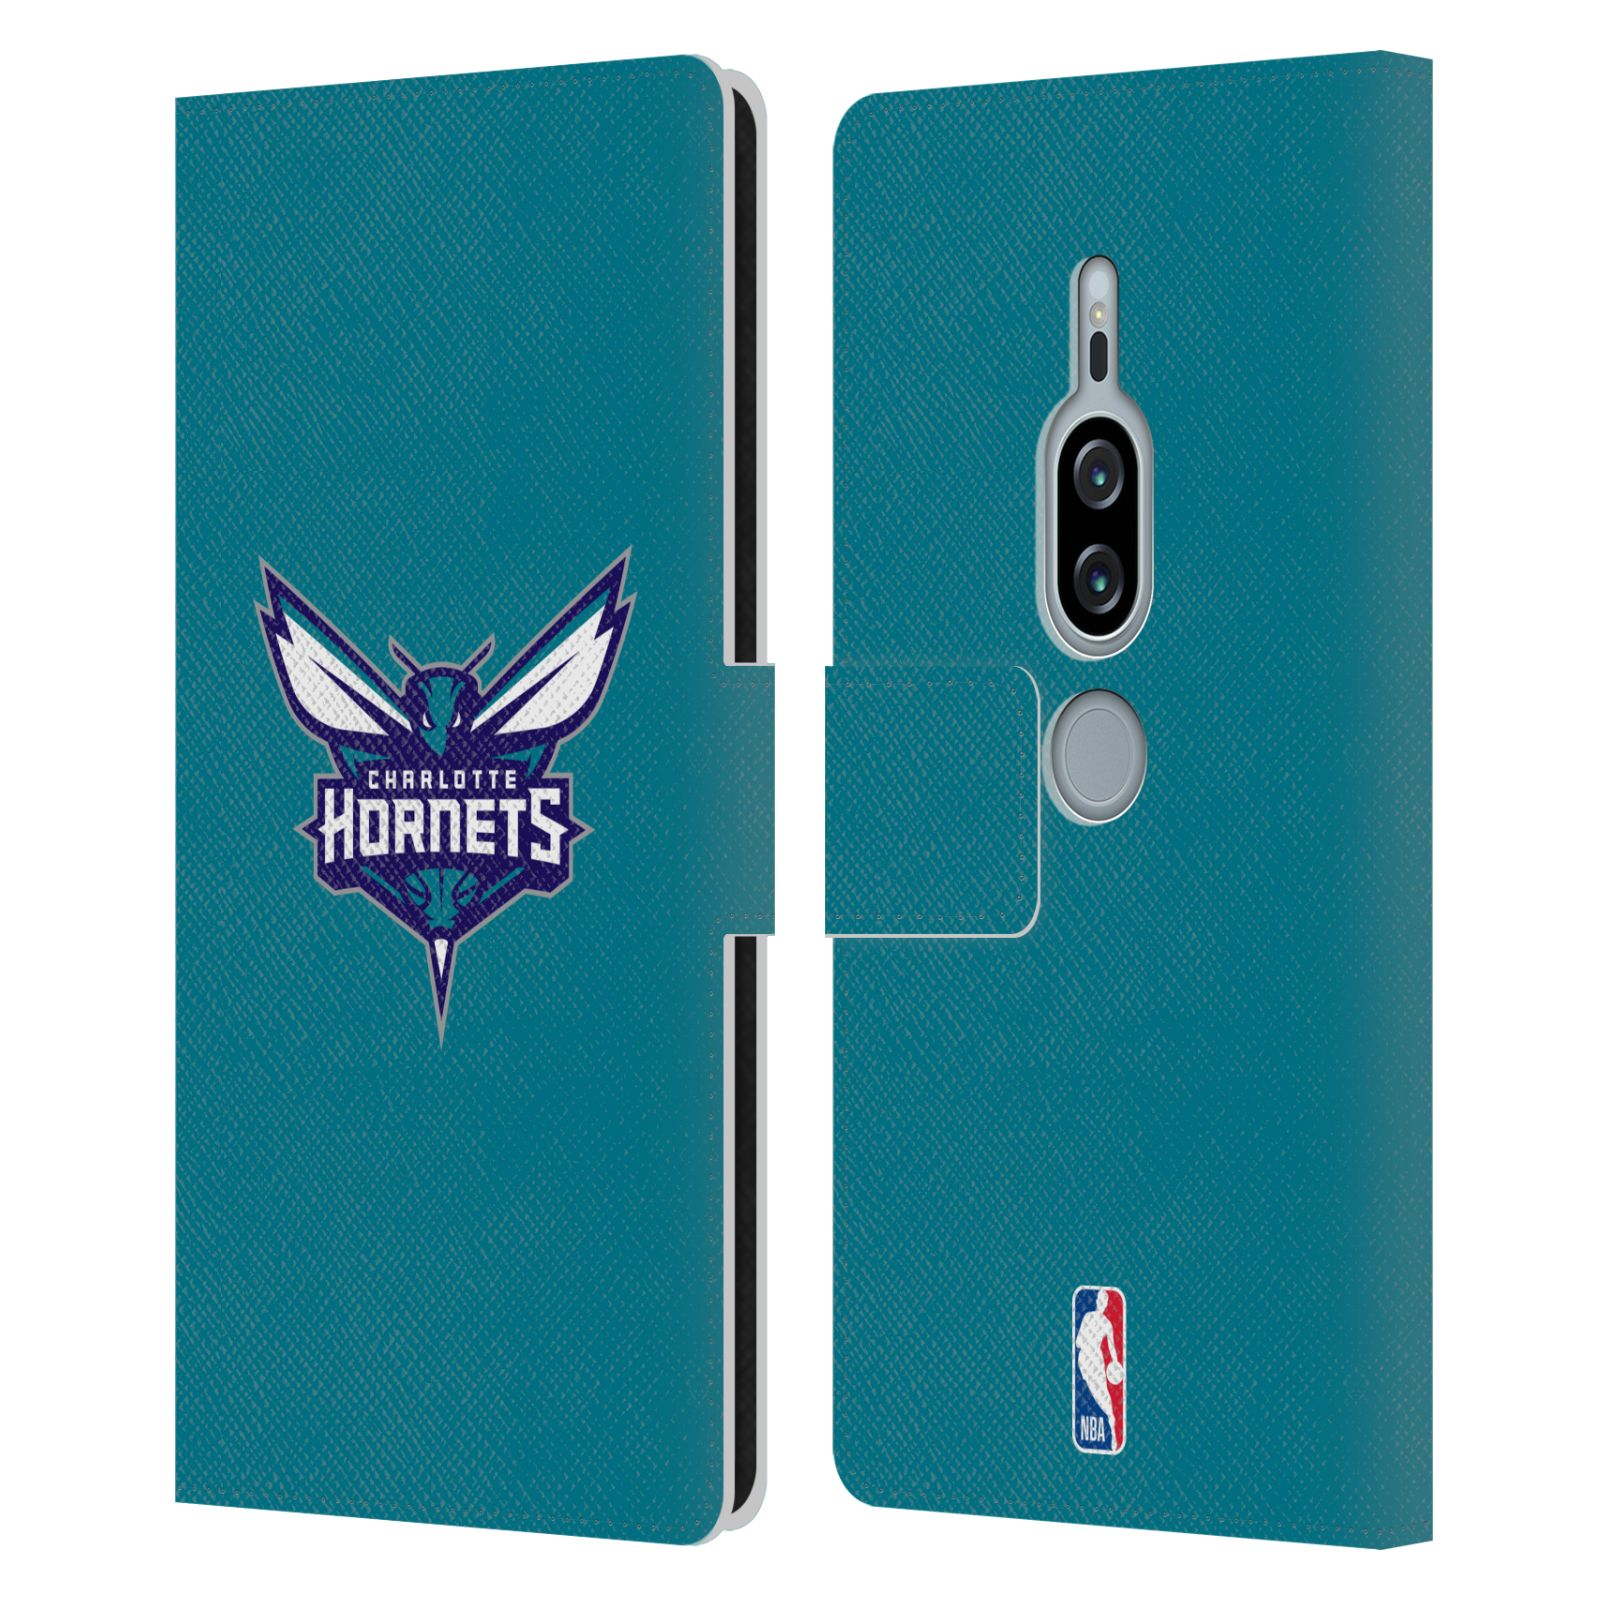 Pouzdro na mobil Sony Xperia XZ2 Premium - Head Case -NBA - Charlotte Hornets modrá barva znak